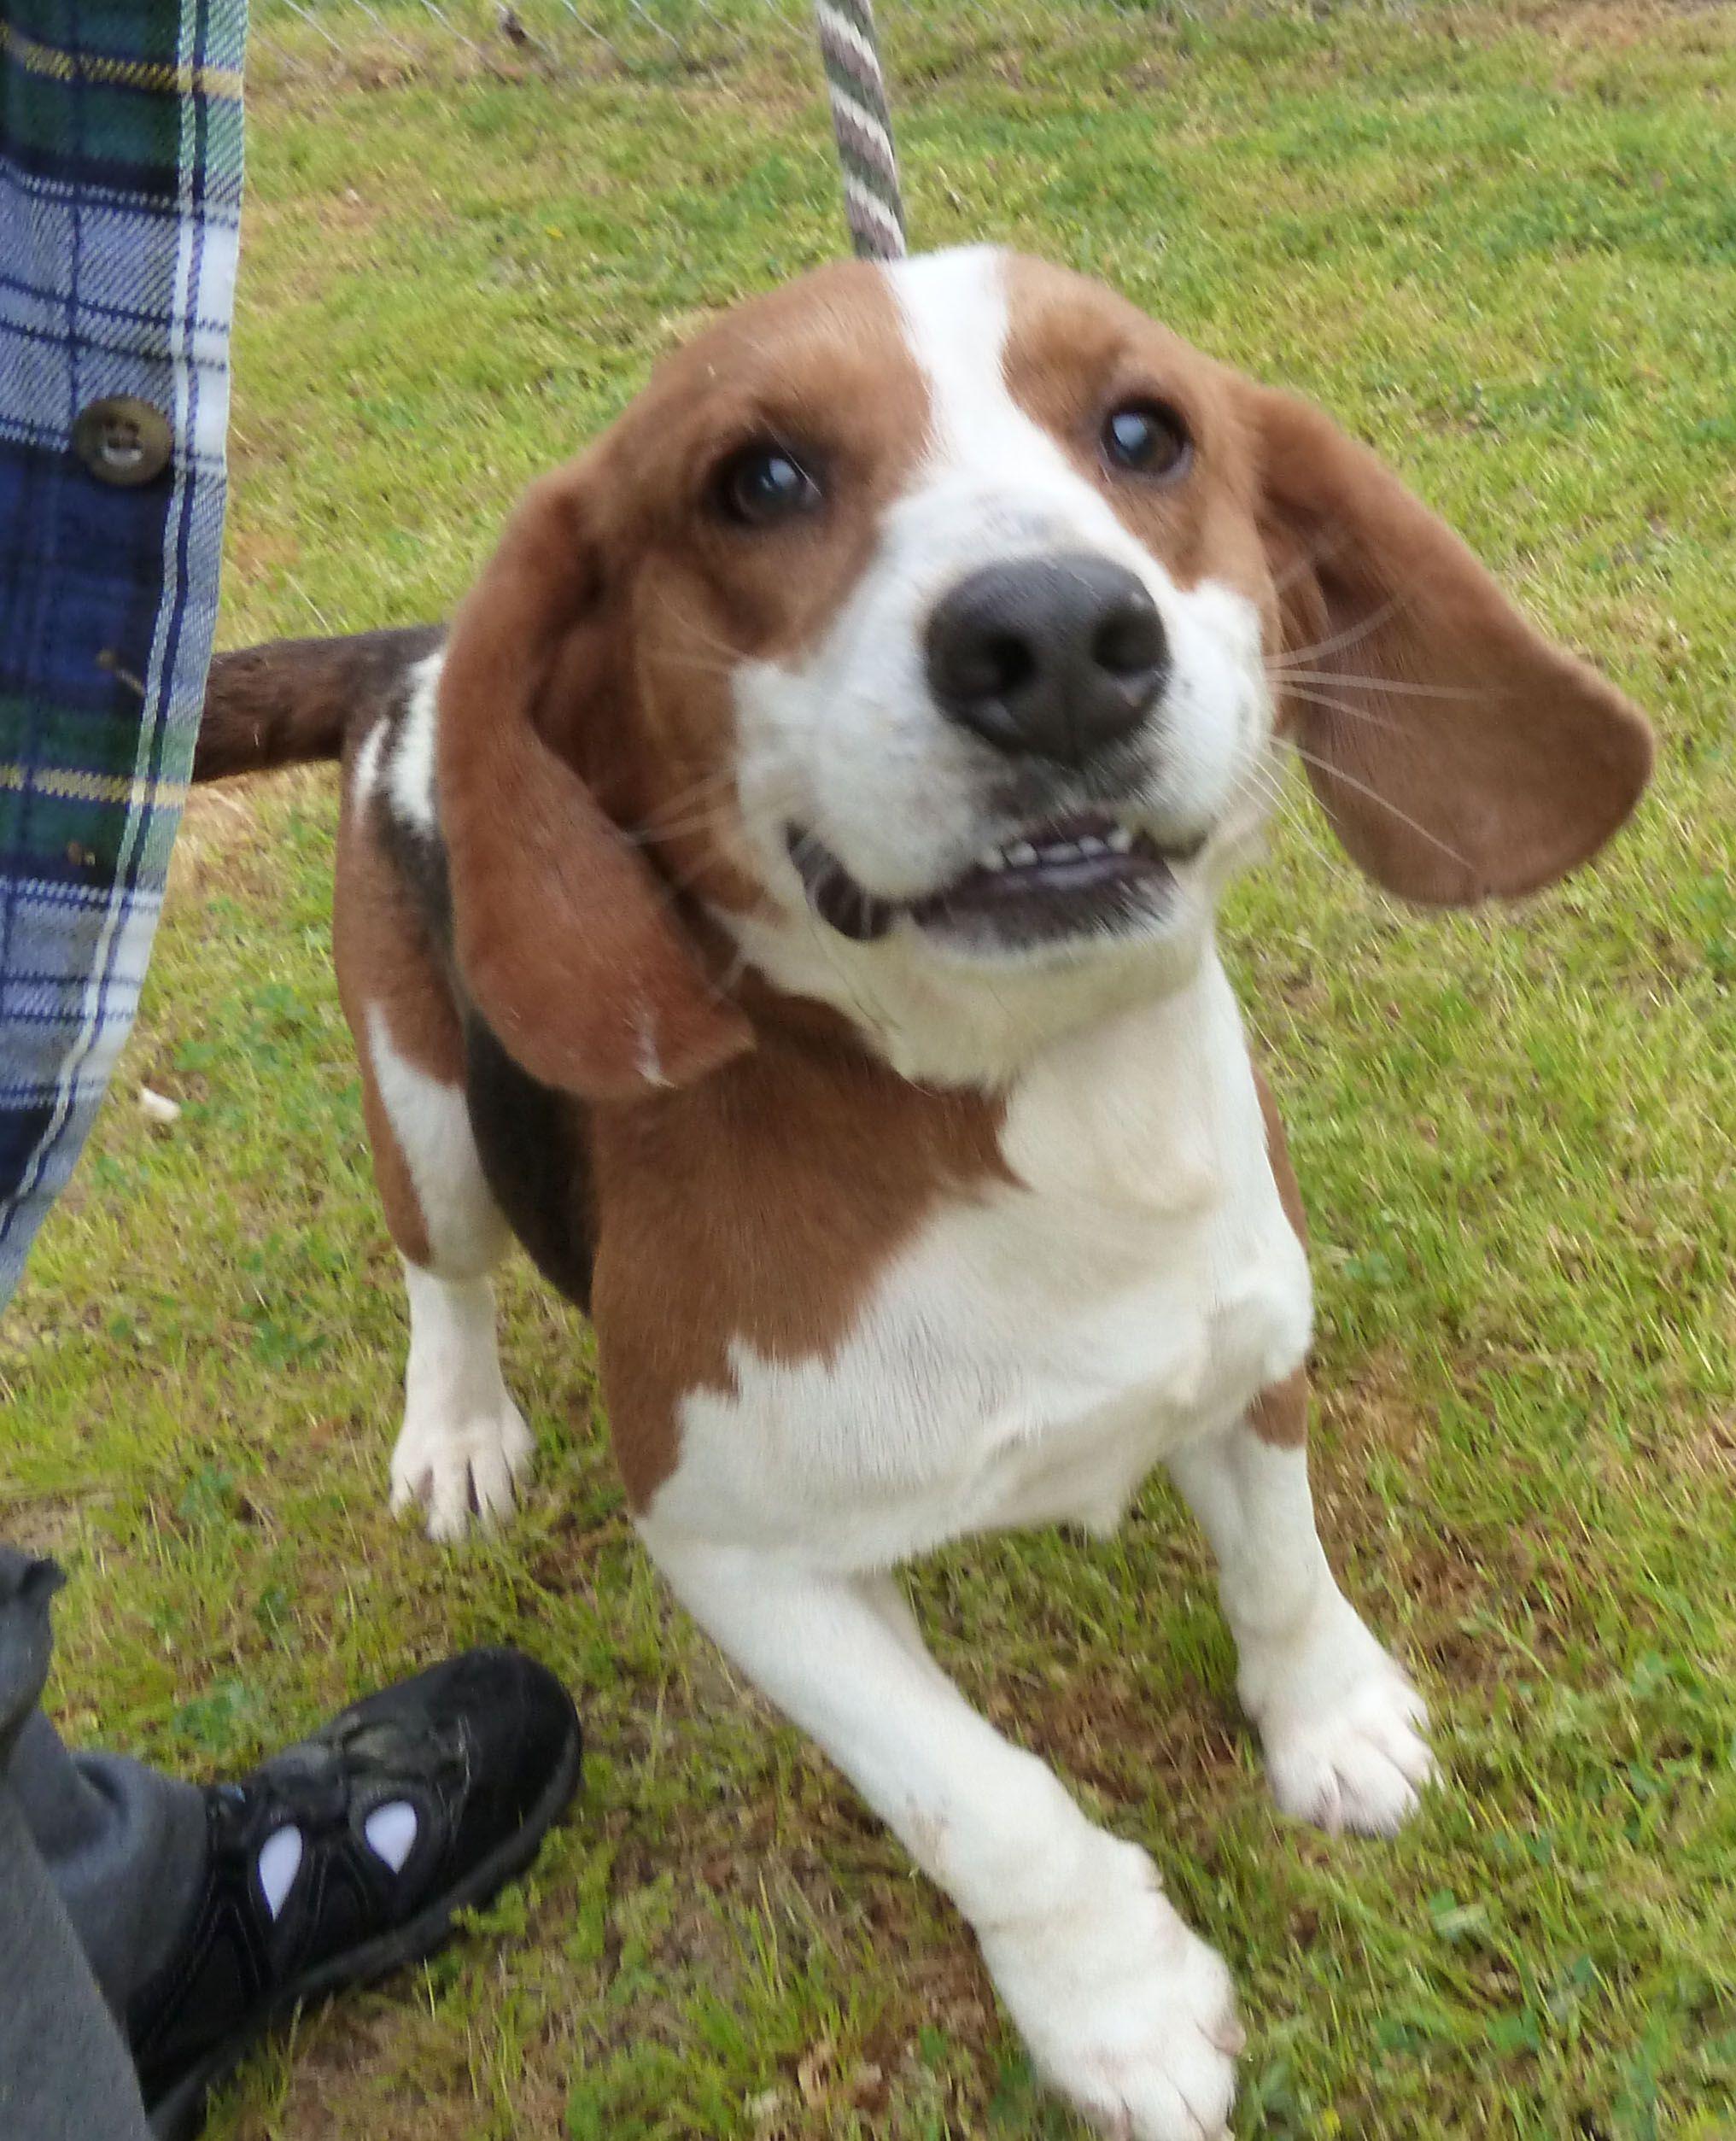 Bagle Hound dog for Adoption in Ashland, VA. ADN528742 on